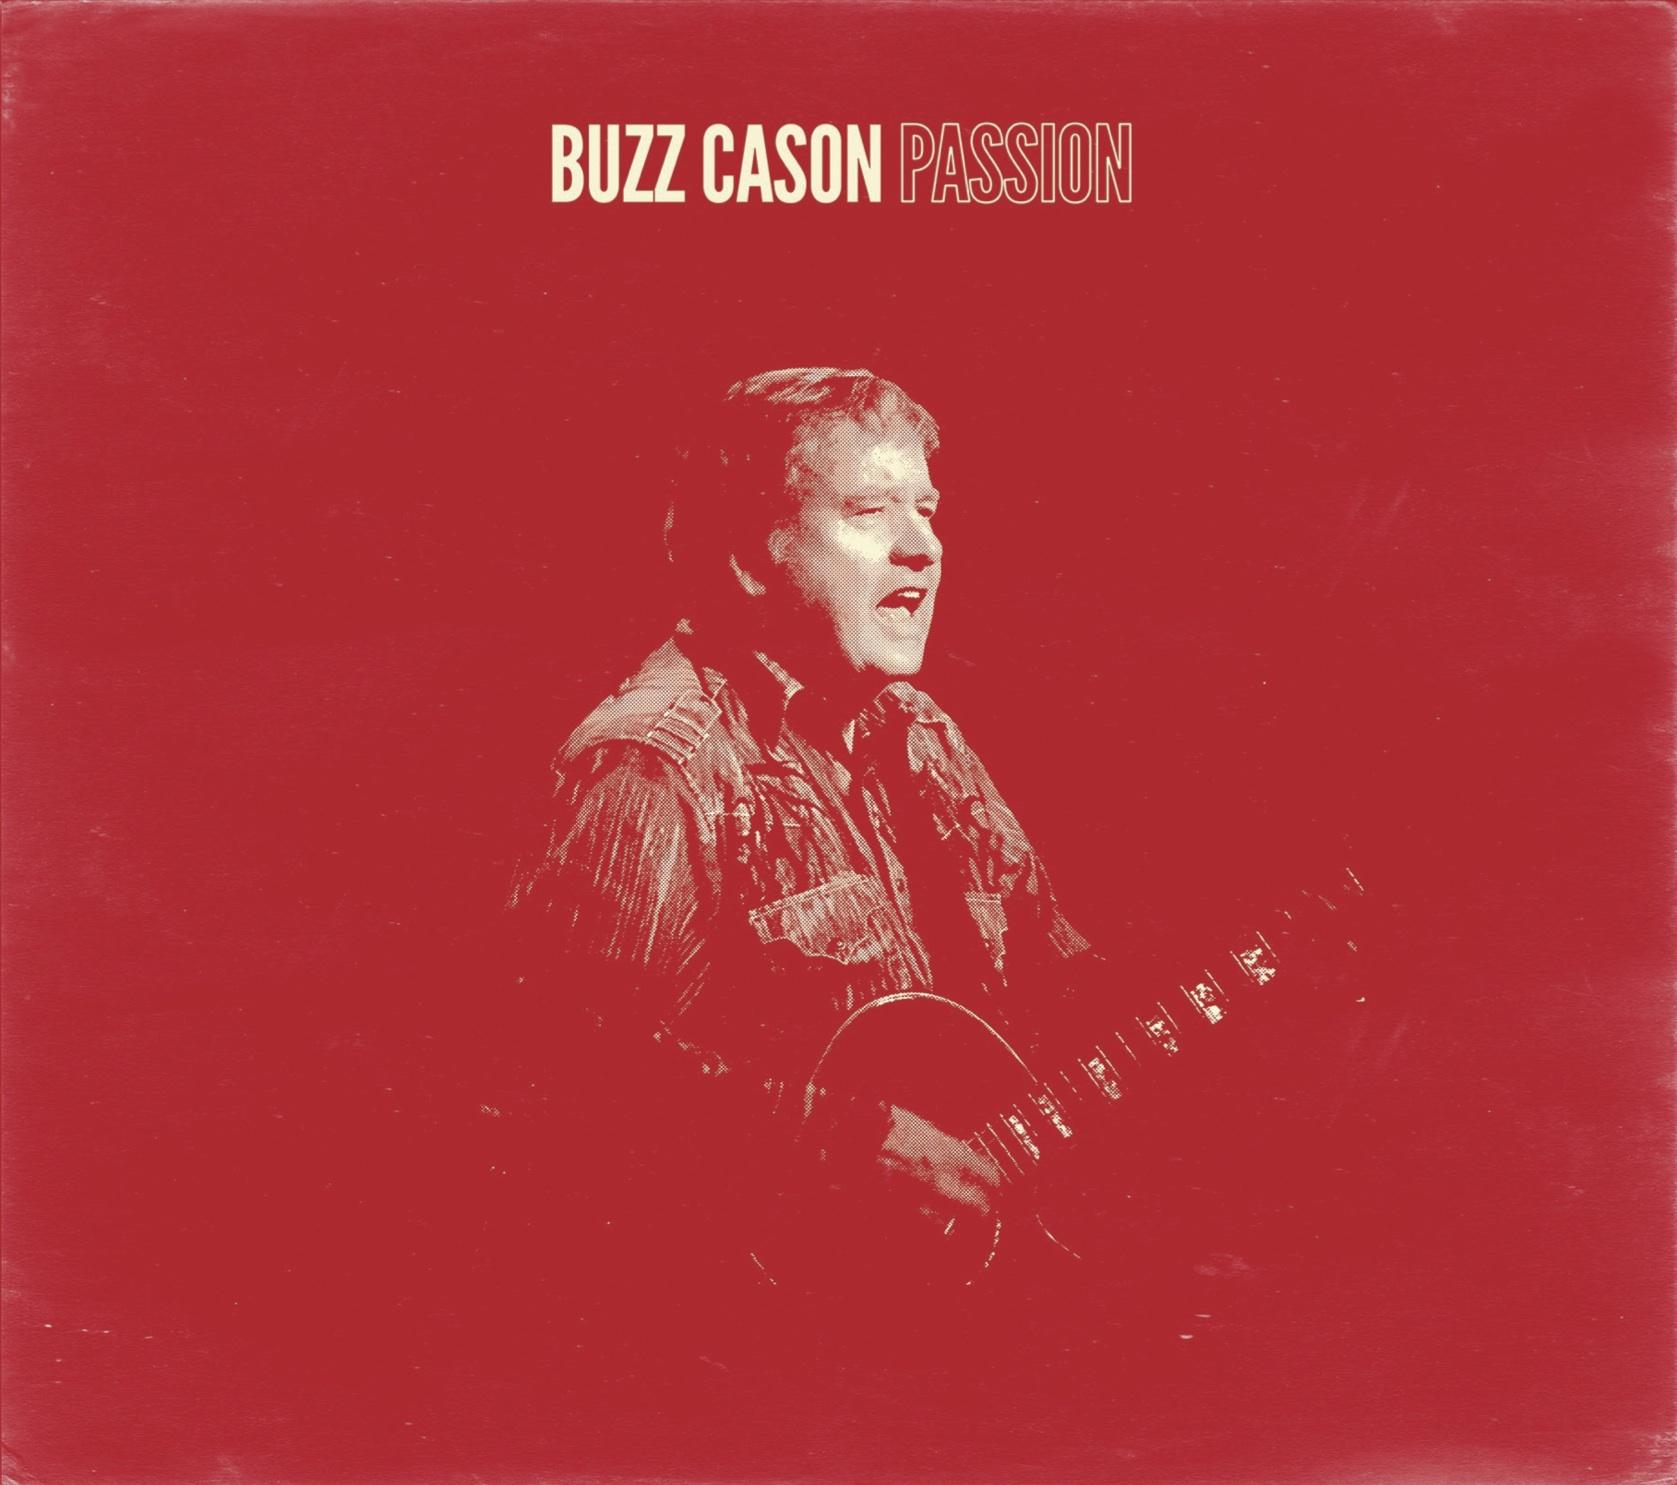 Buzz Cason Passion Cover.jpg